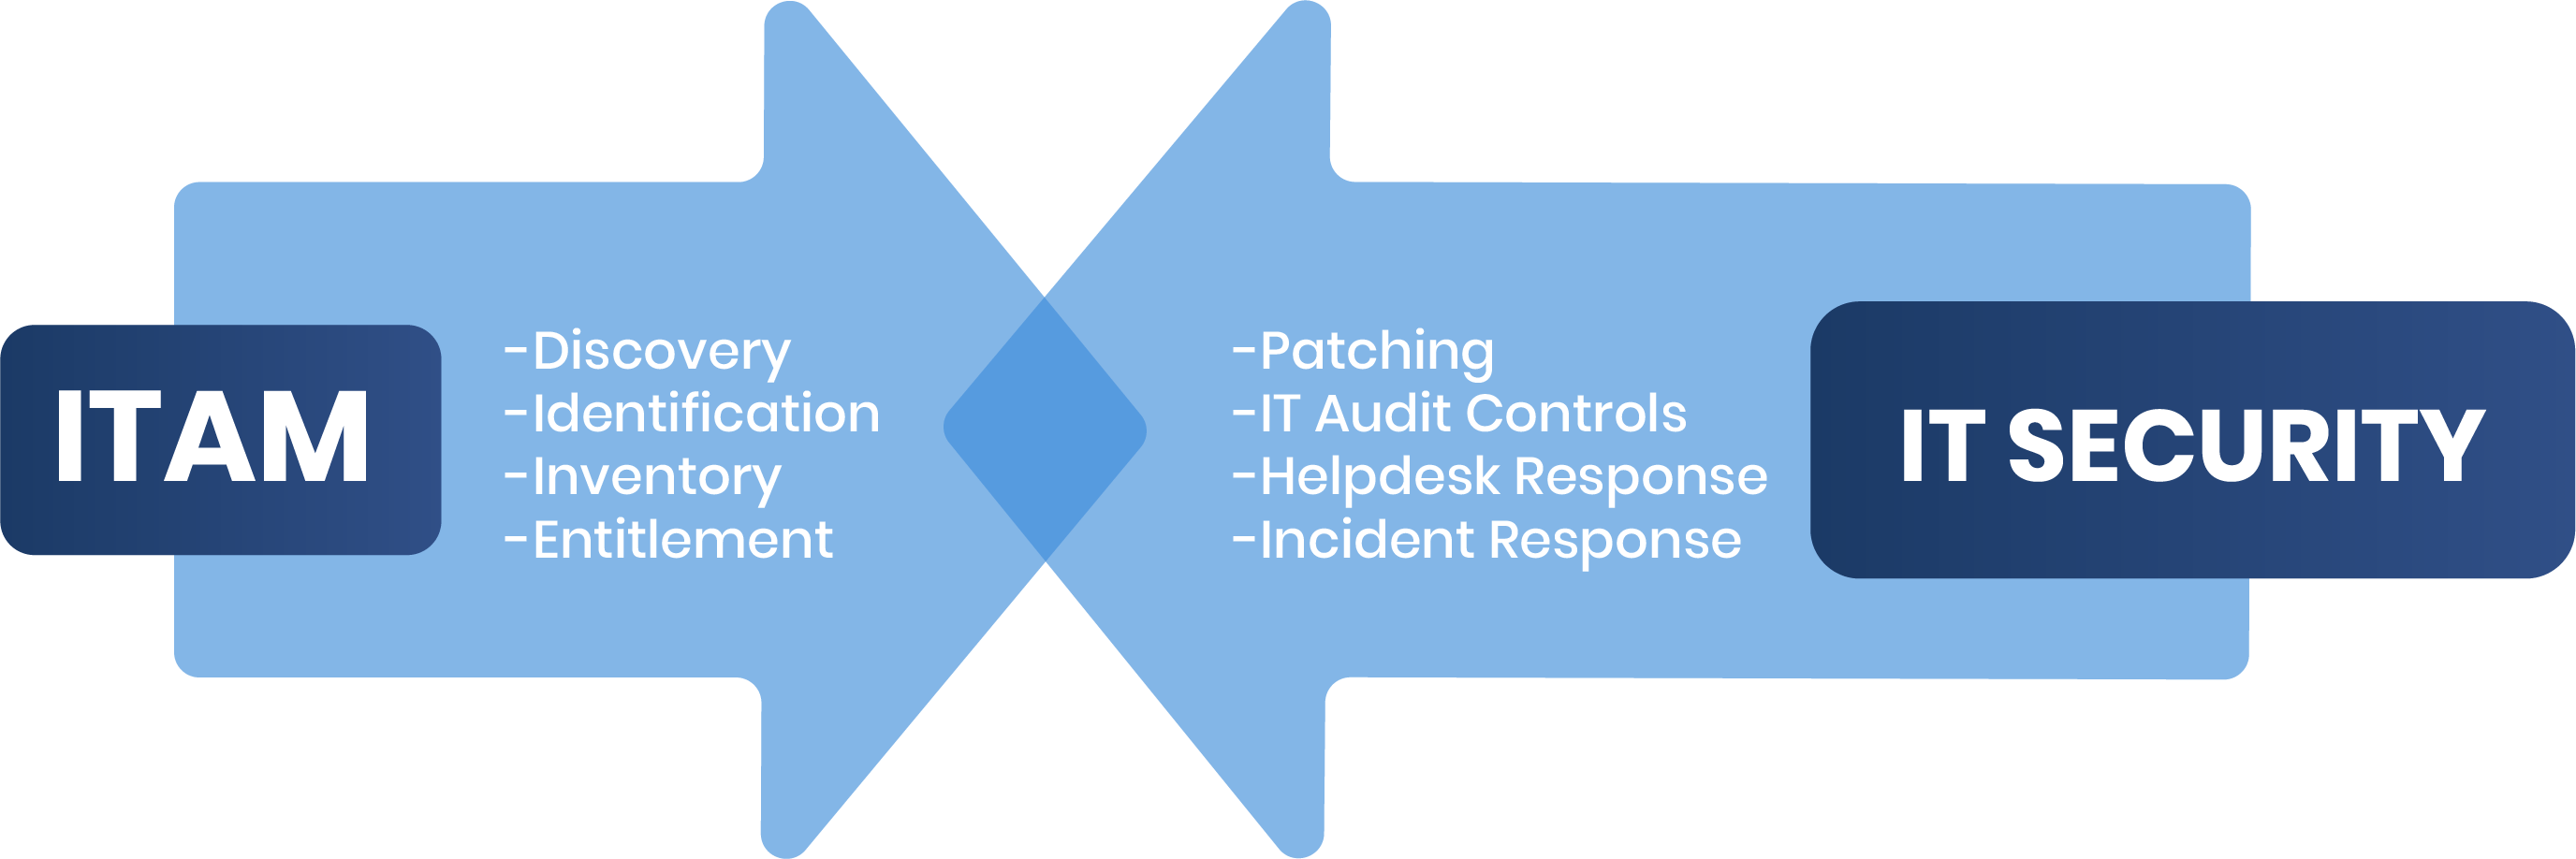 ITAM and IT security